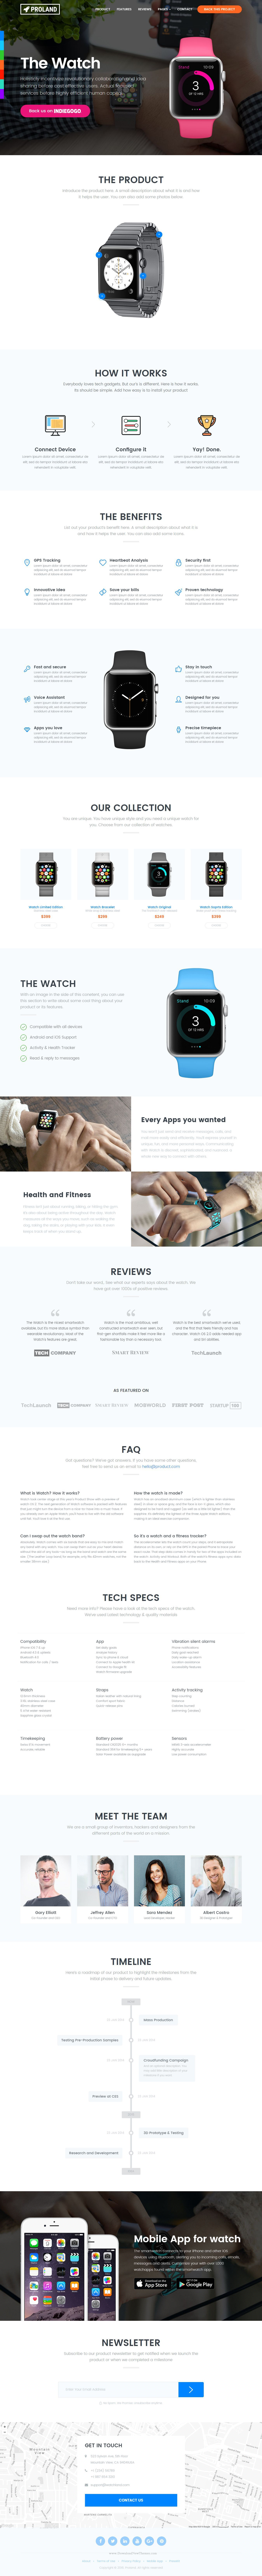 Product Landing Page Template - Proland | Pinterest